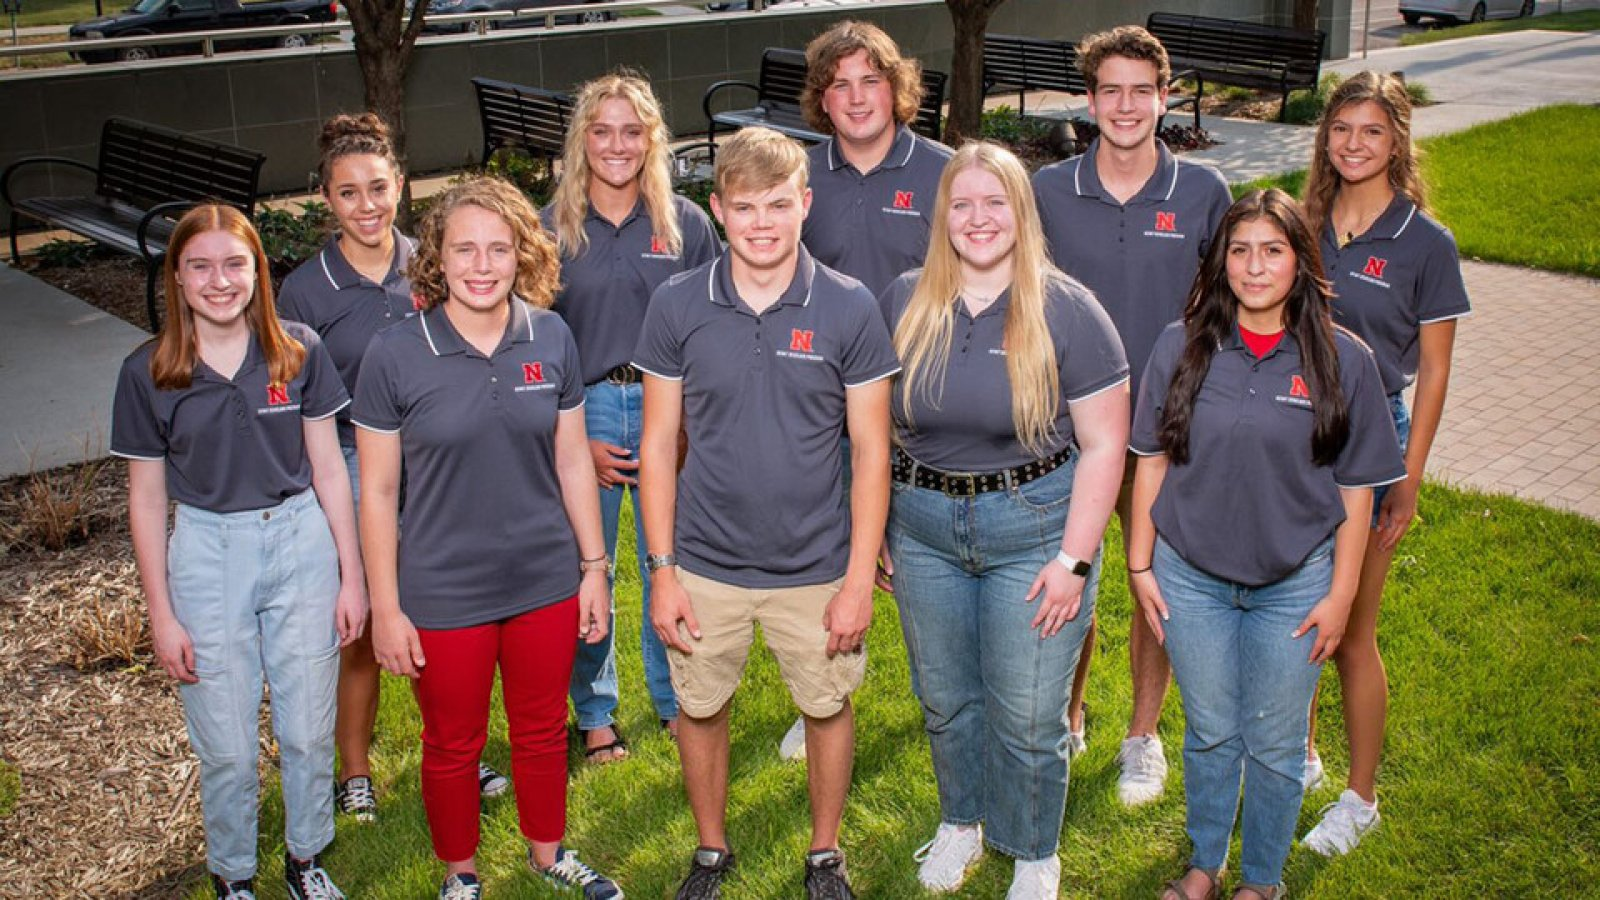 The inaugural cohort of Kiewit Scholars includes (from left) Grace Kerr, Taylor Hosick, Carolyn Fairchild, Nicole Dirks, Wyatt Cassidy, Scott Tvrdy, Hayden Wulf, Matt Feldmann, Felicity Sierra, and Rebeca Young.